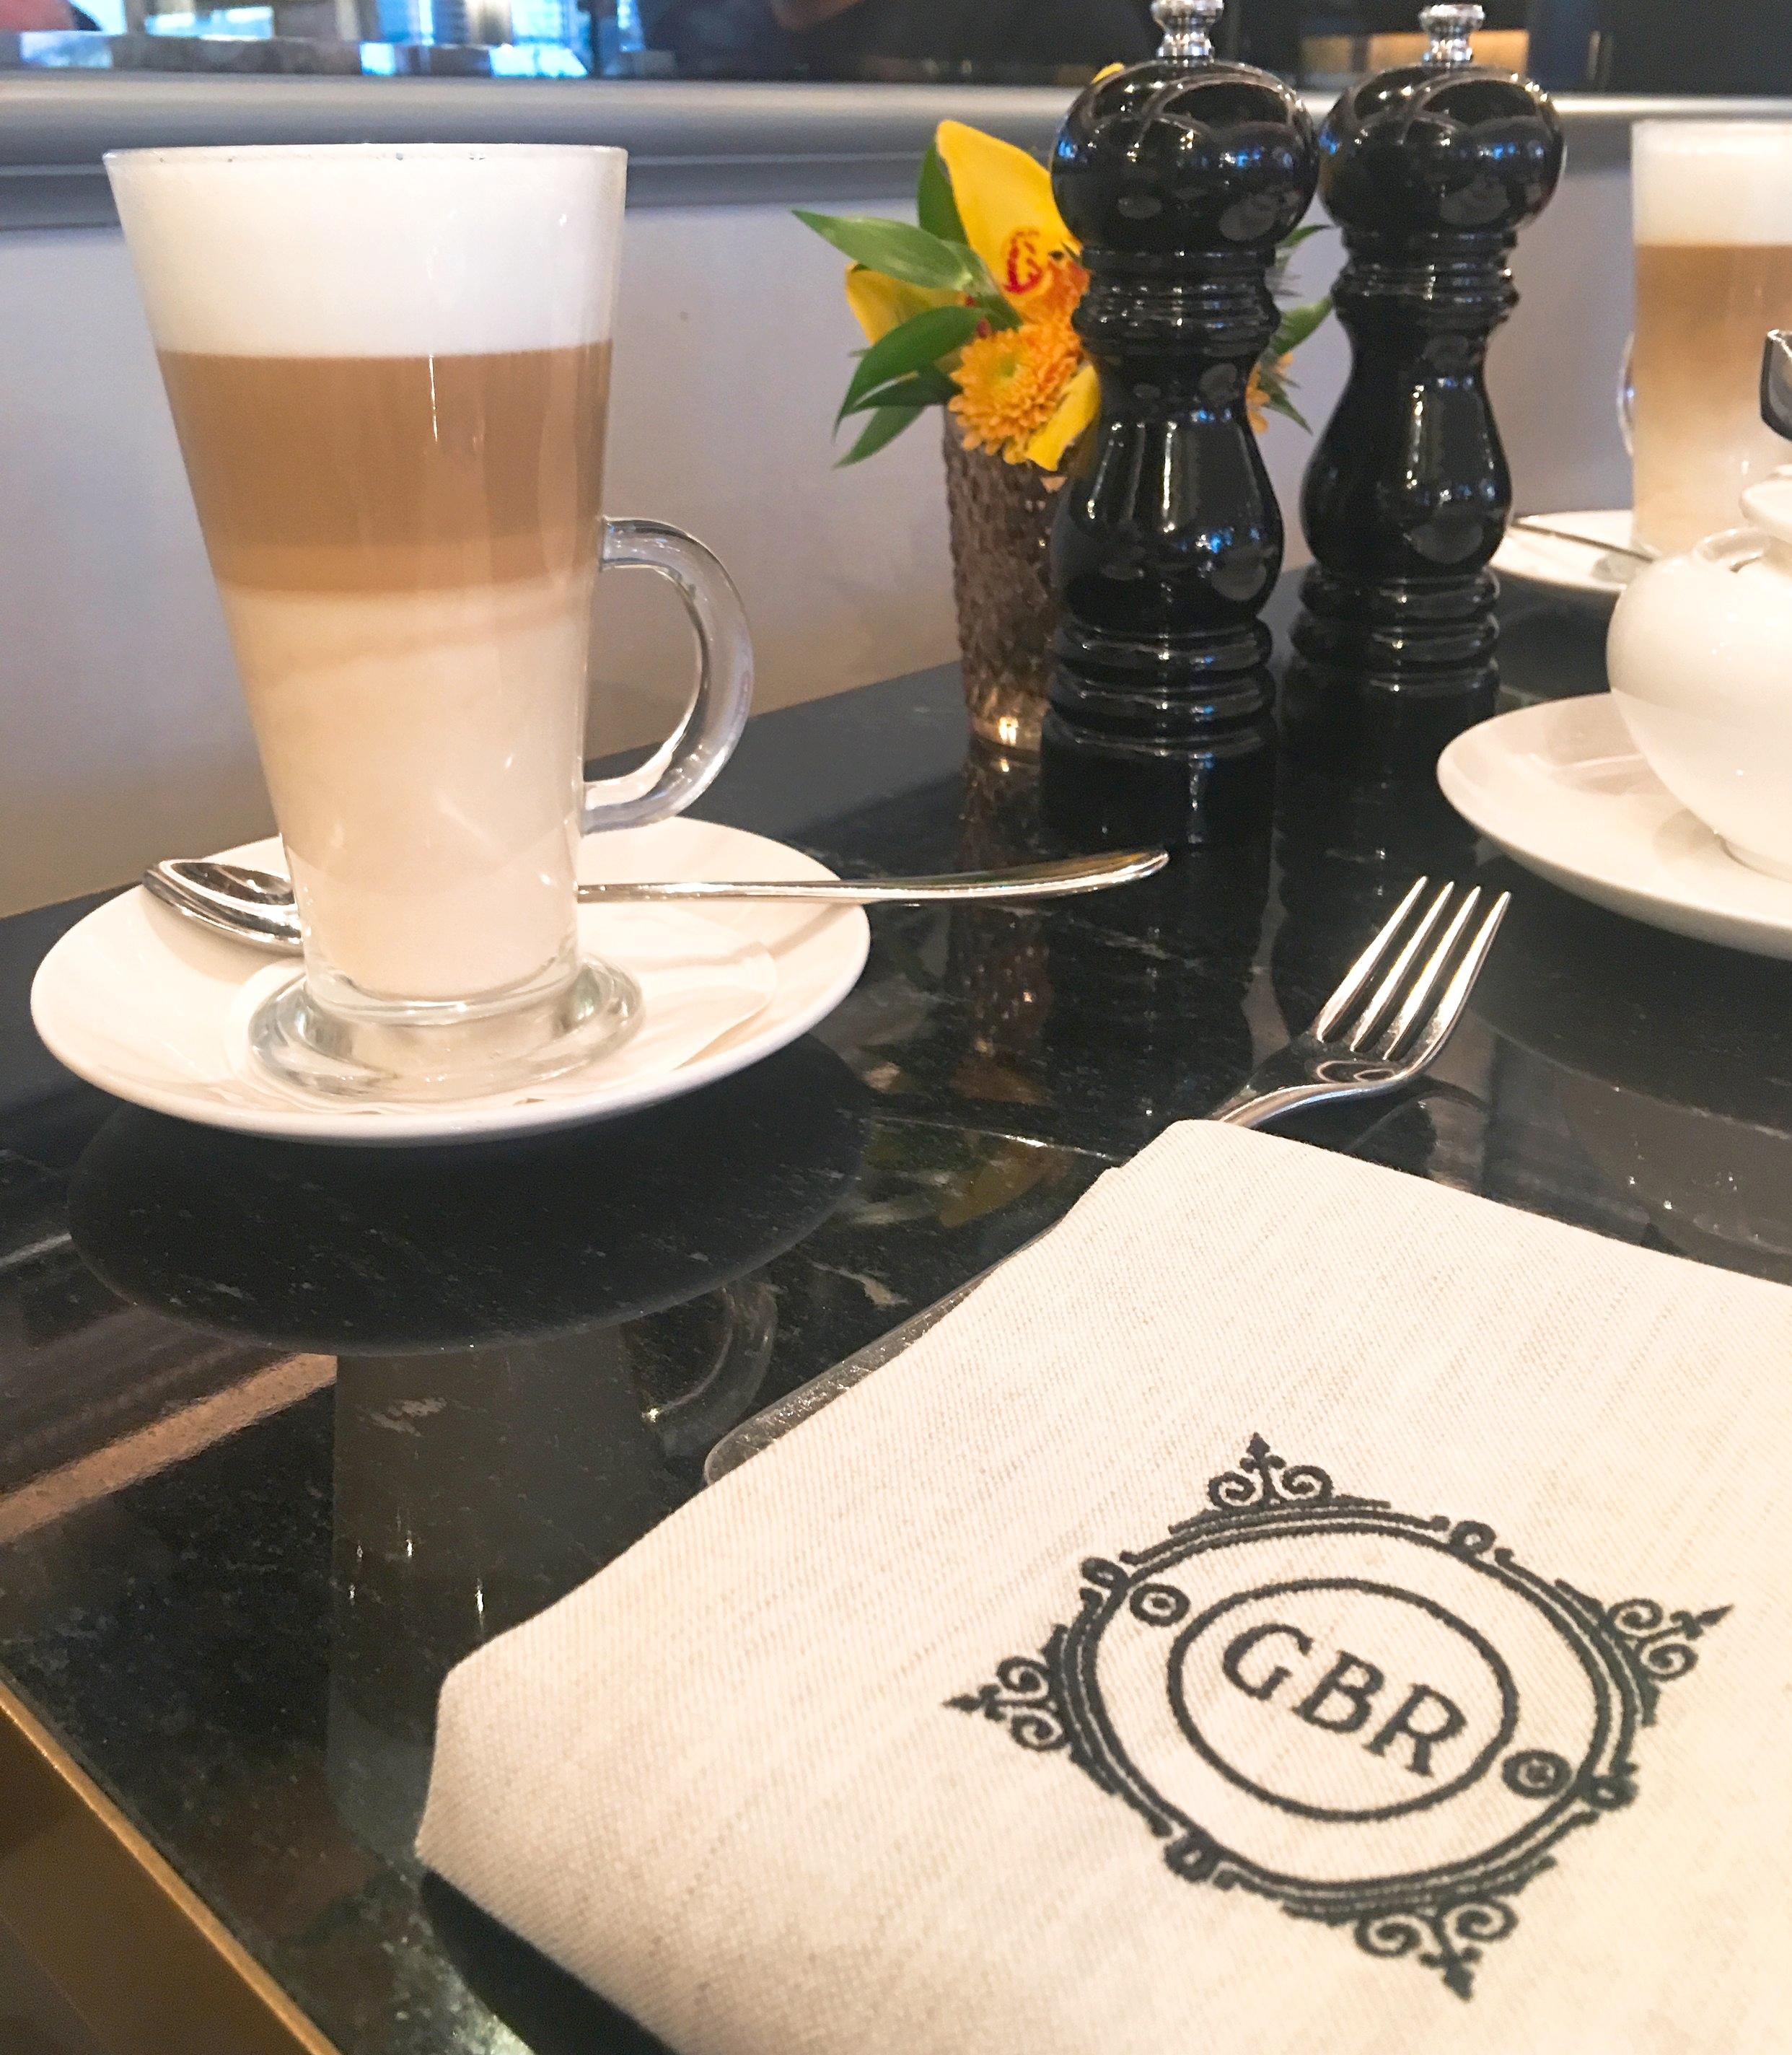 Breakfast at GBR at Dukes Hotel London